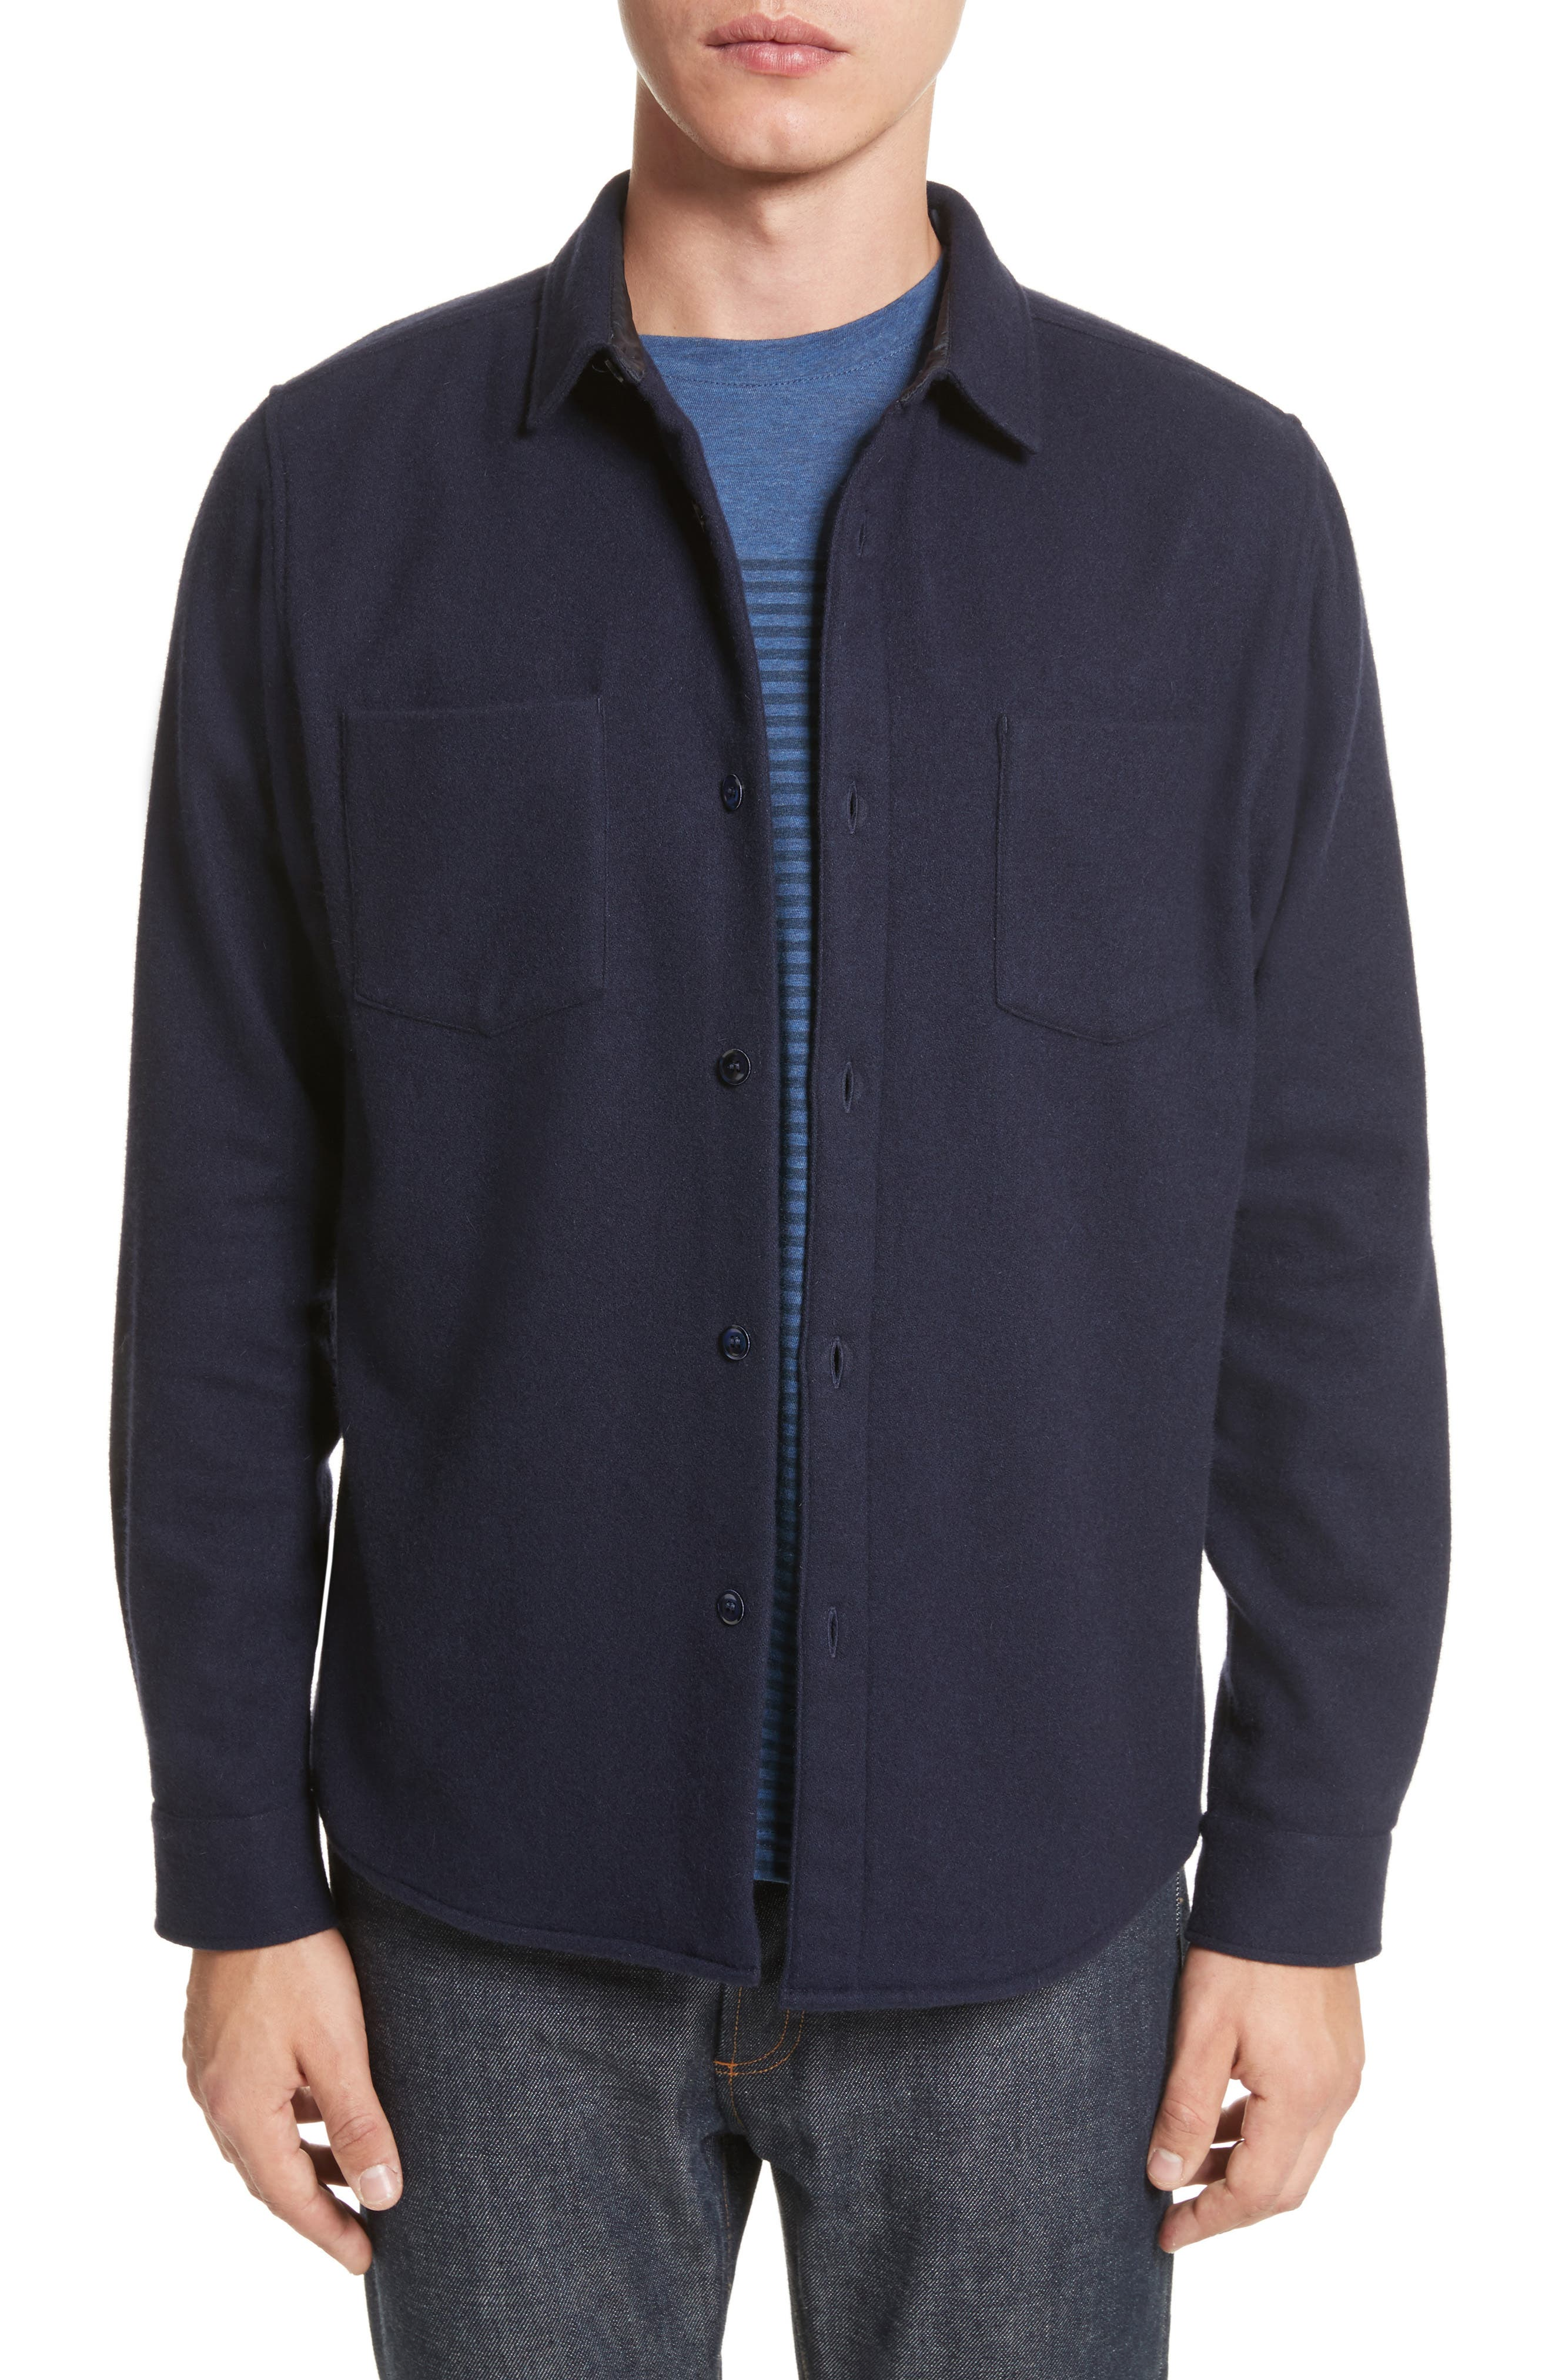 Fritz Wool Blend Shirt Jacket,                             Main thumbnail 1, color,                             410